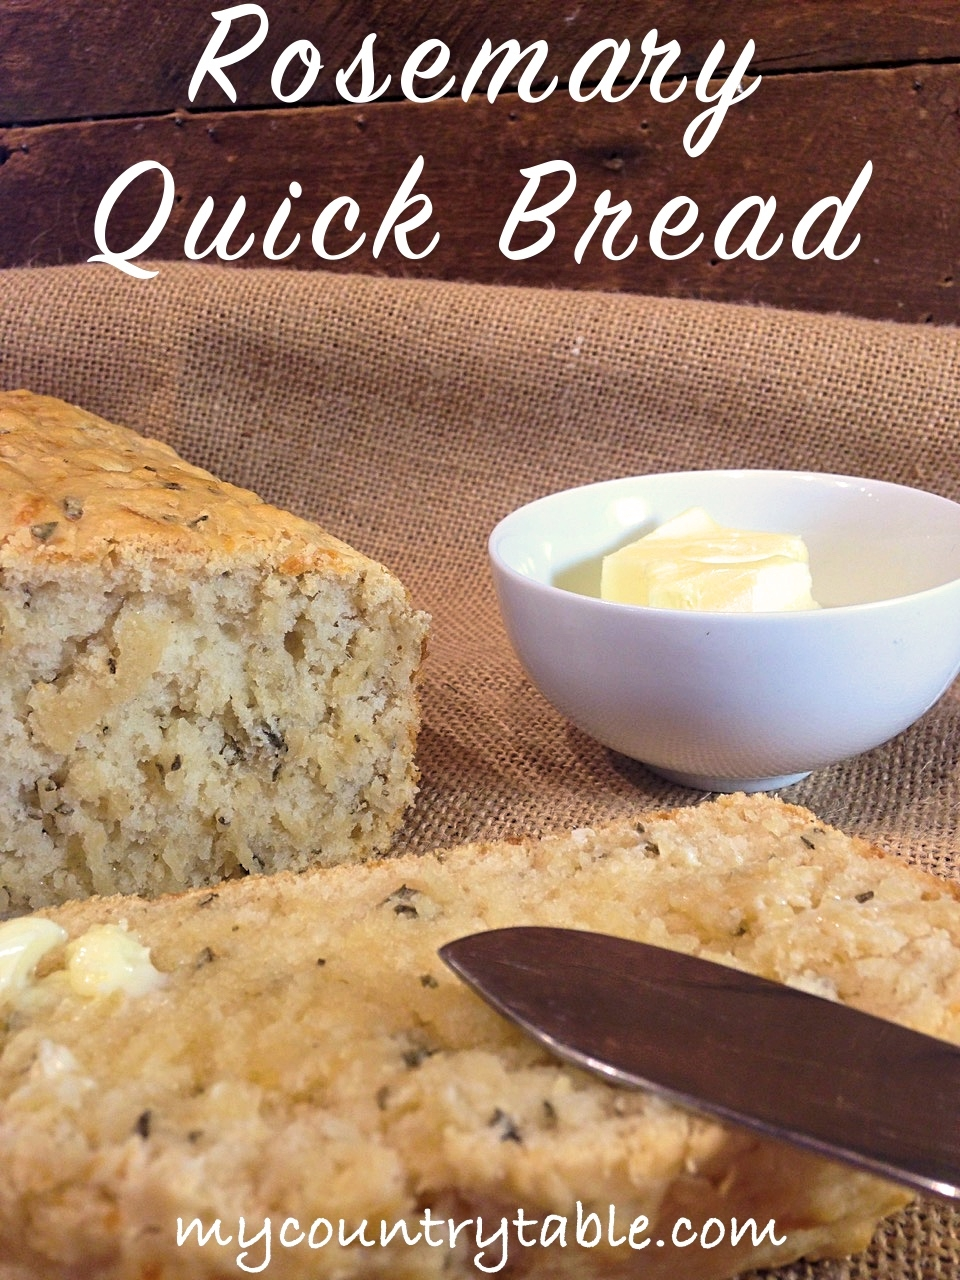 Rosemary Quick Bread